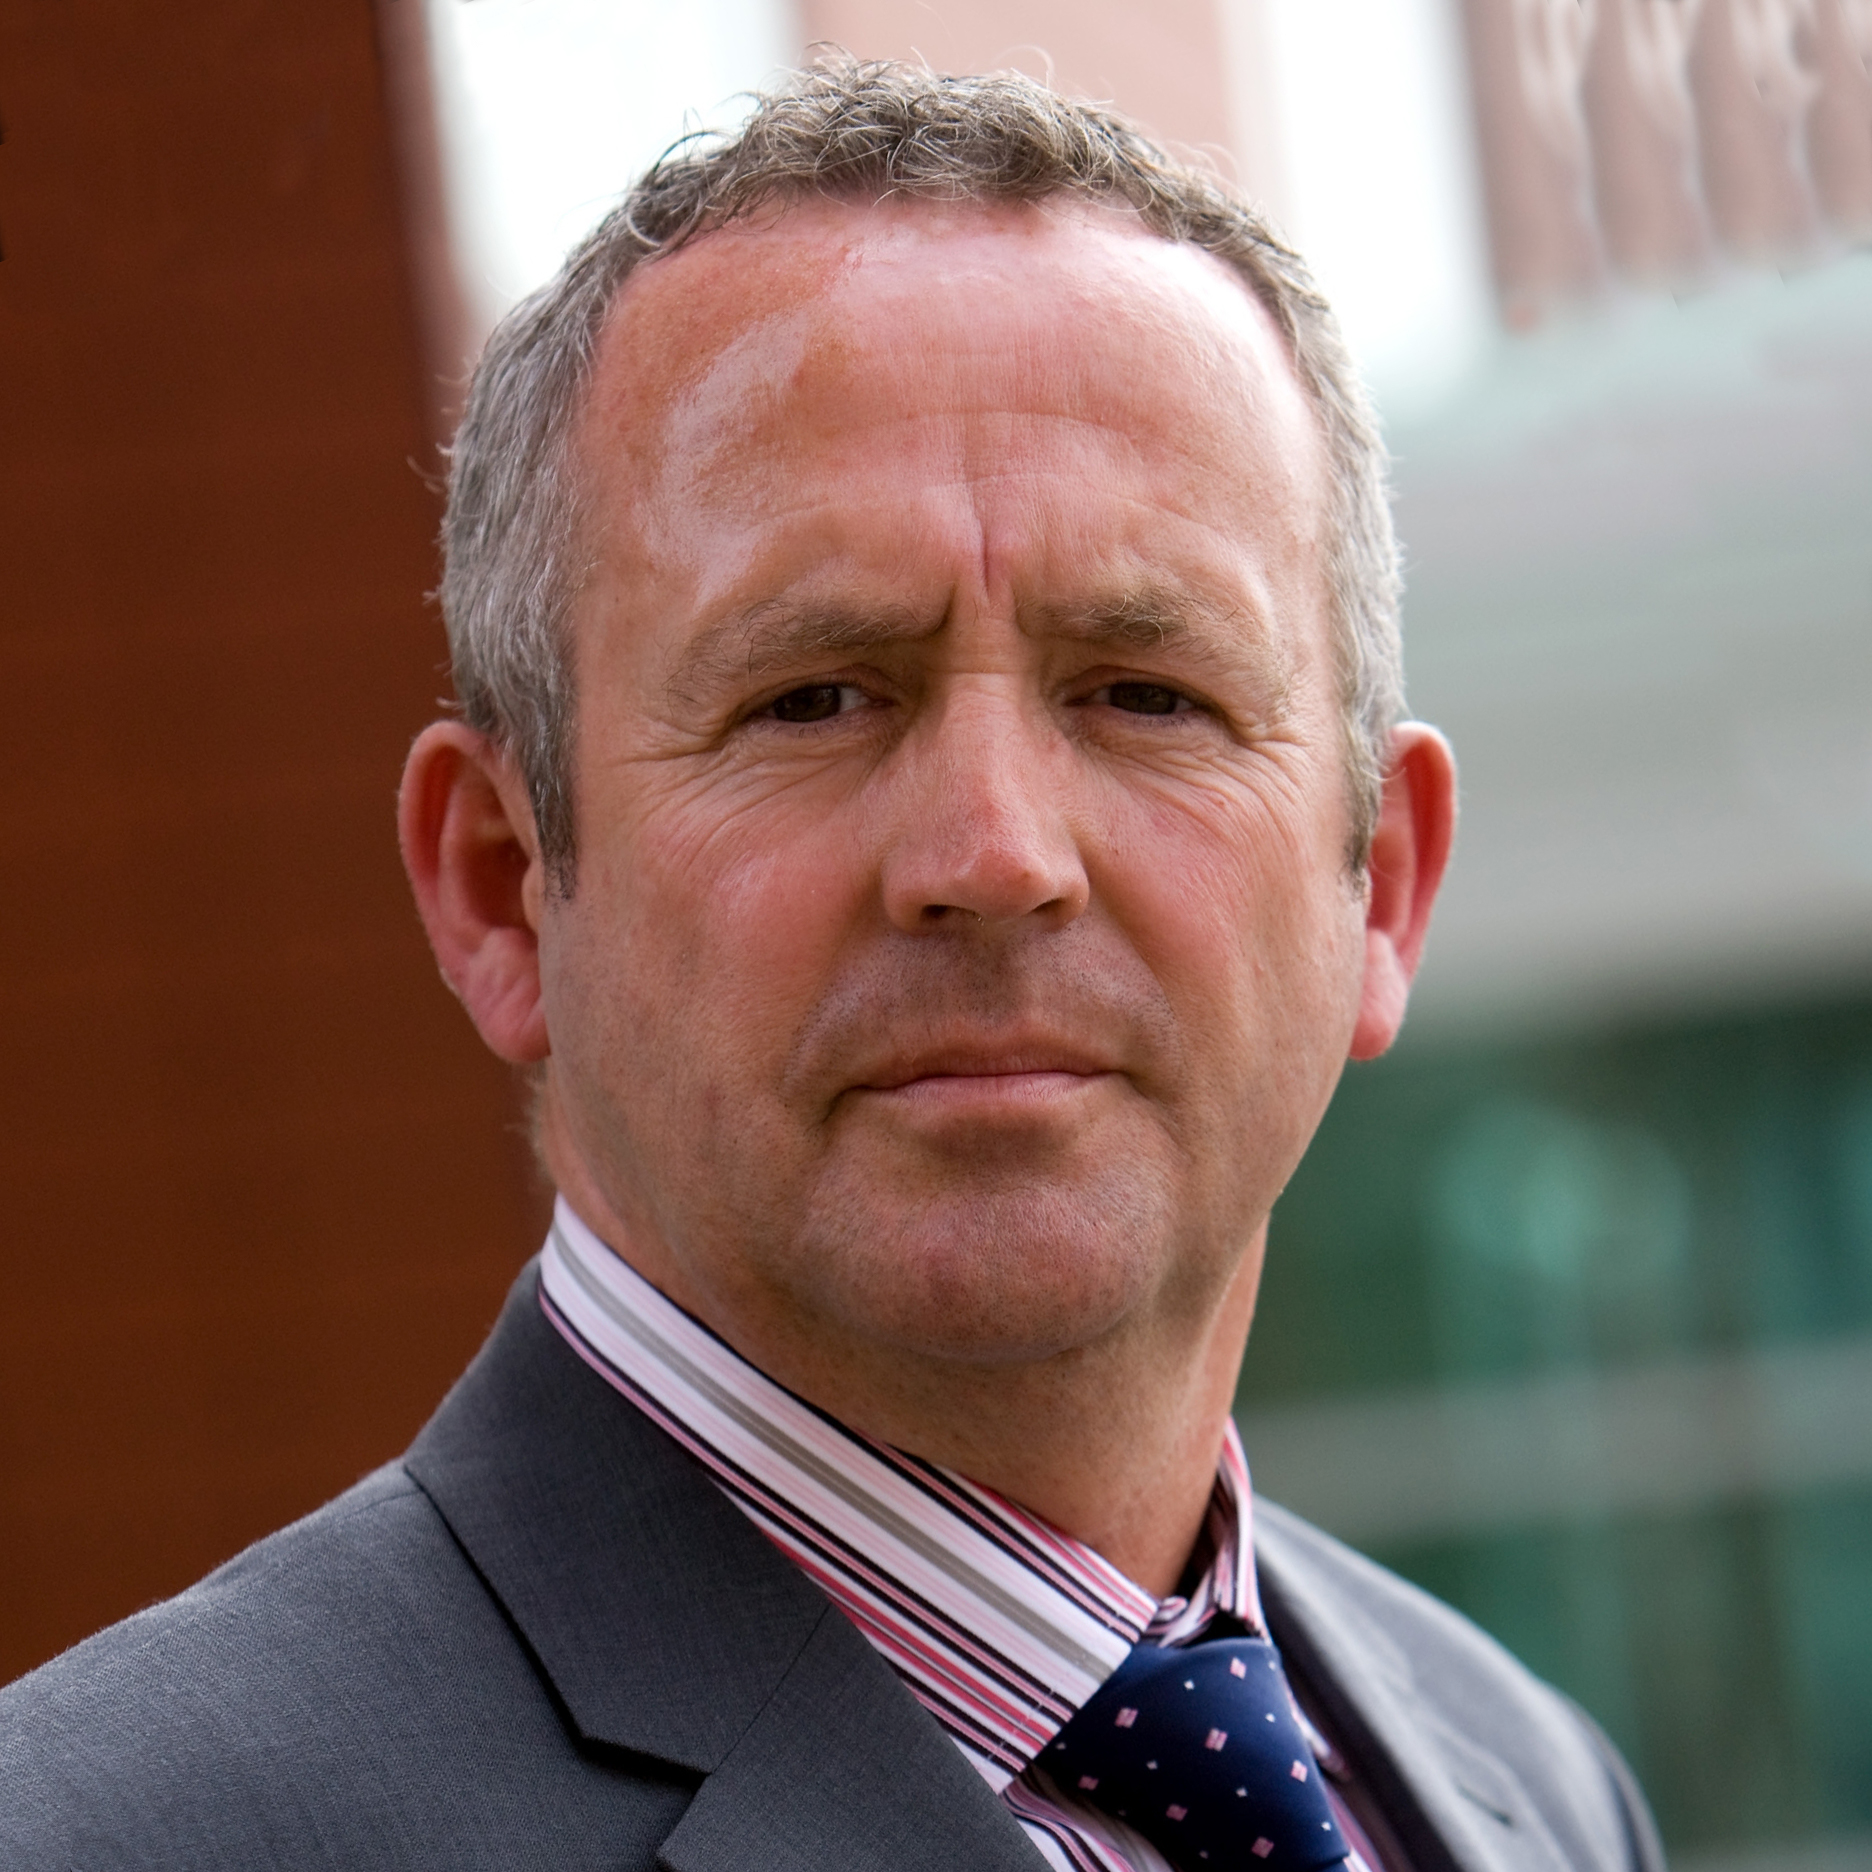 Ian Price Cardiff Business School Cardiff University